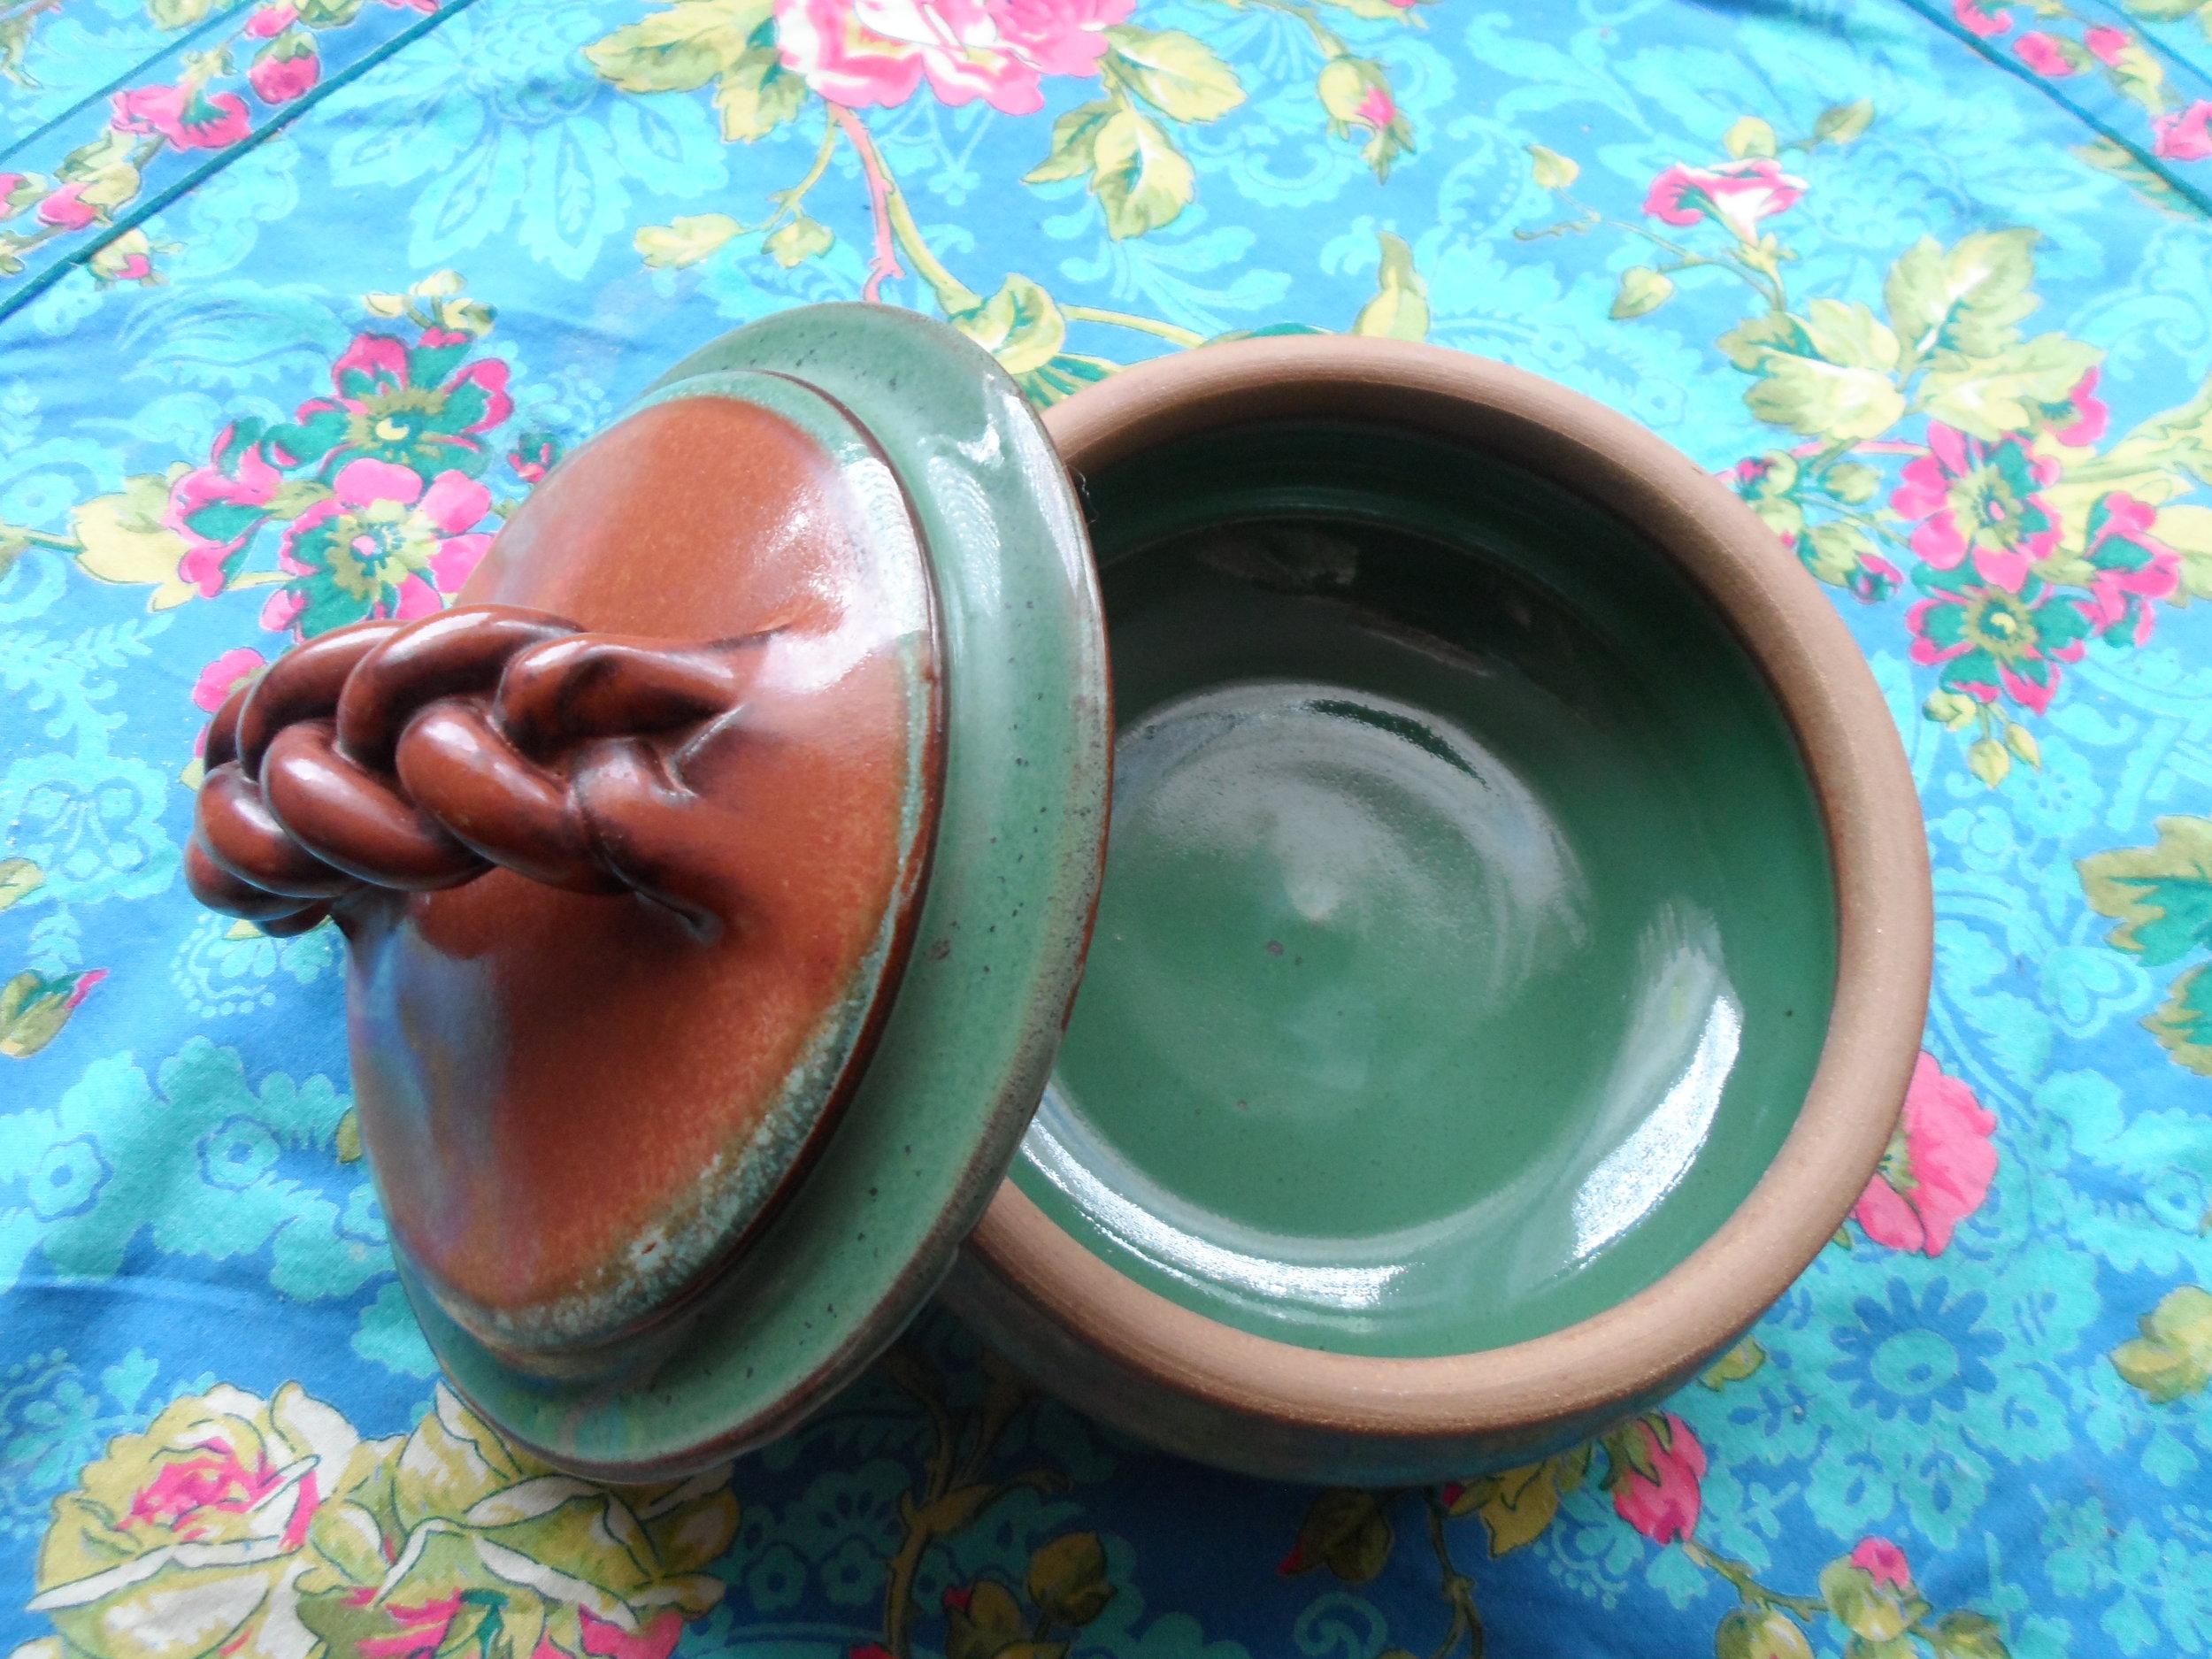 Ridgeline Pottery - Sturdy pottery that reflects the Vermont landscape